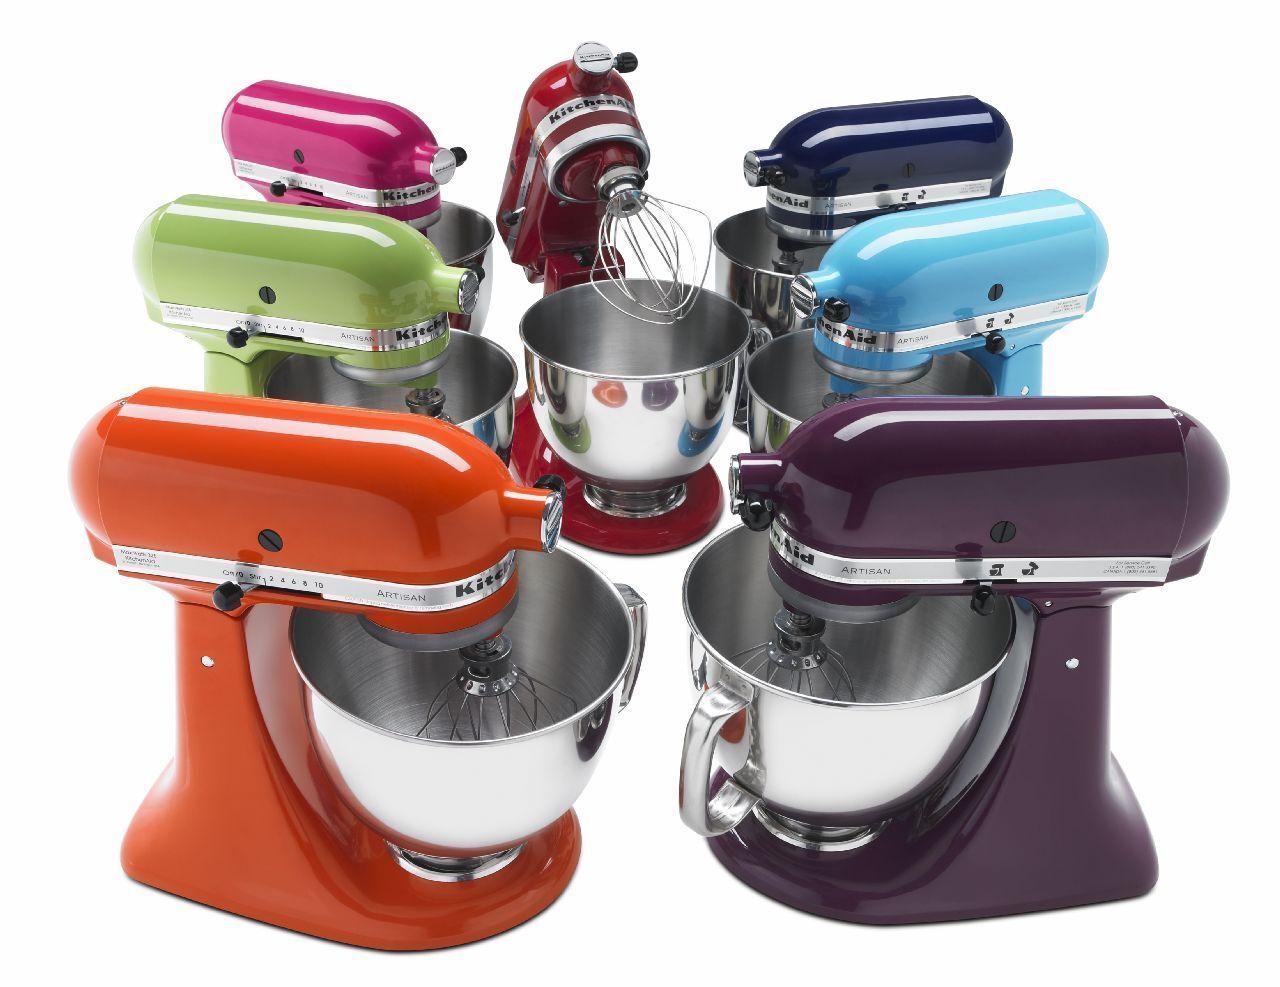 kitchenaid-stand-mixer-tilt-5-qt-rrk150-refurb-of-ksm150ps-artisan-tilt-allmetal